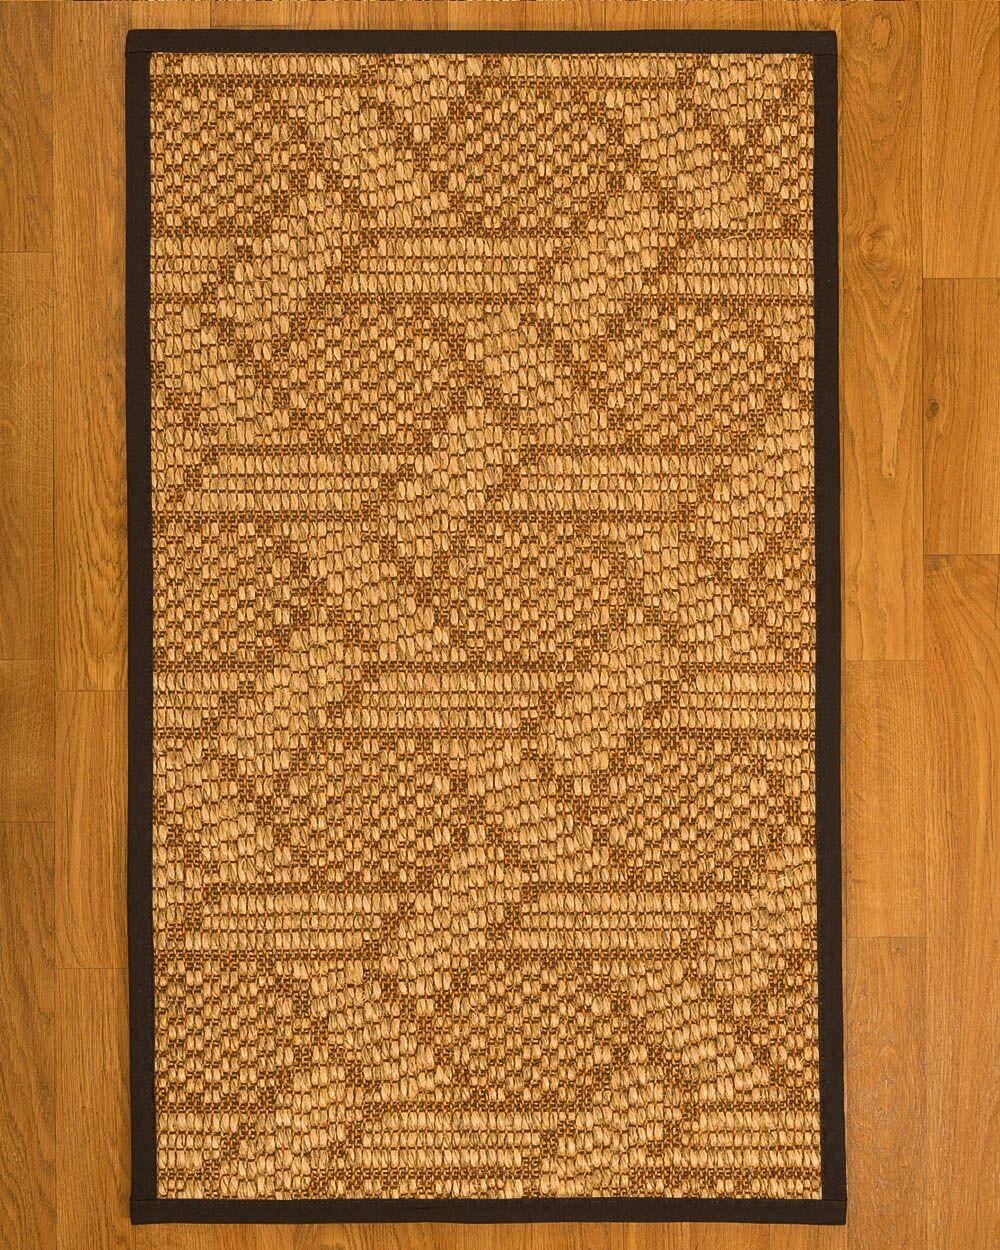 Aalin Hand-Woven Beige Area Rug Rug Size: Rectangle 5' X 8'